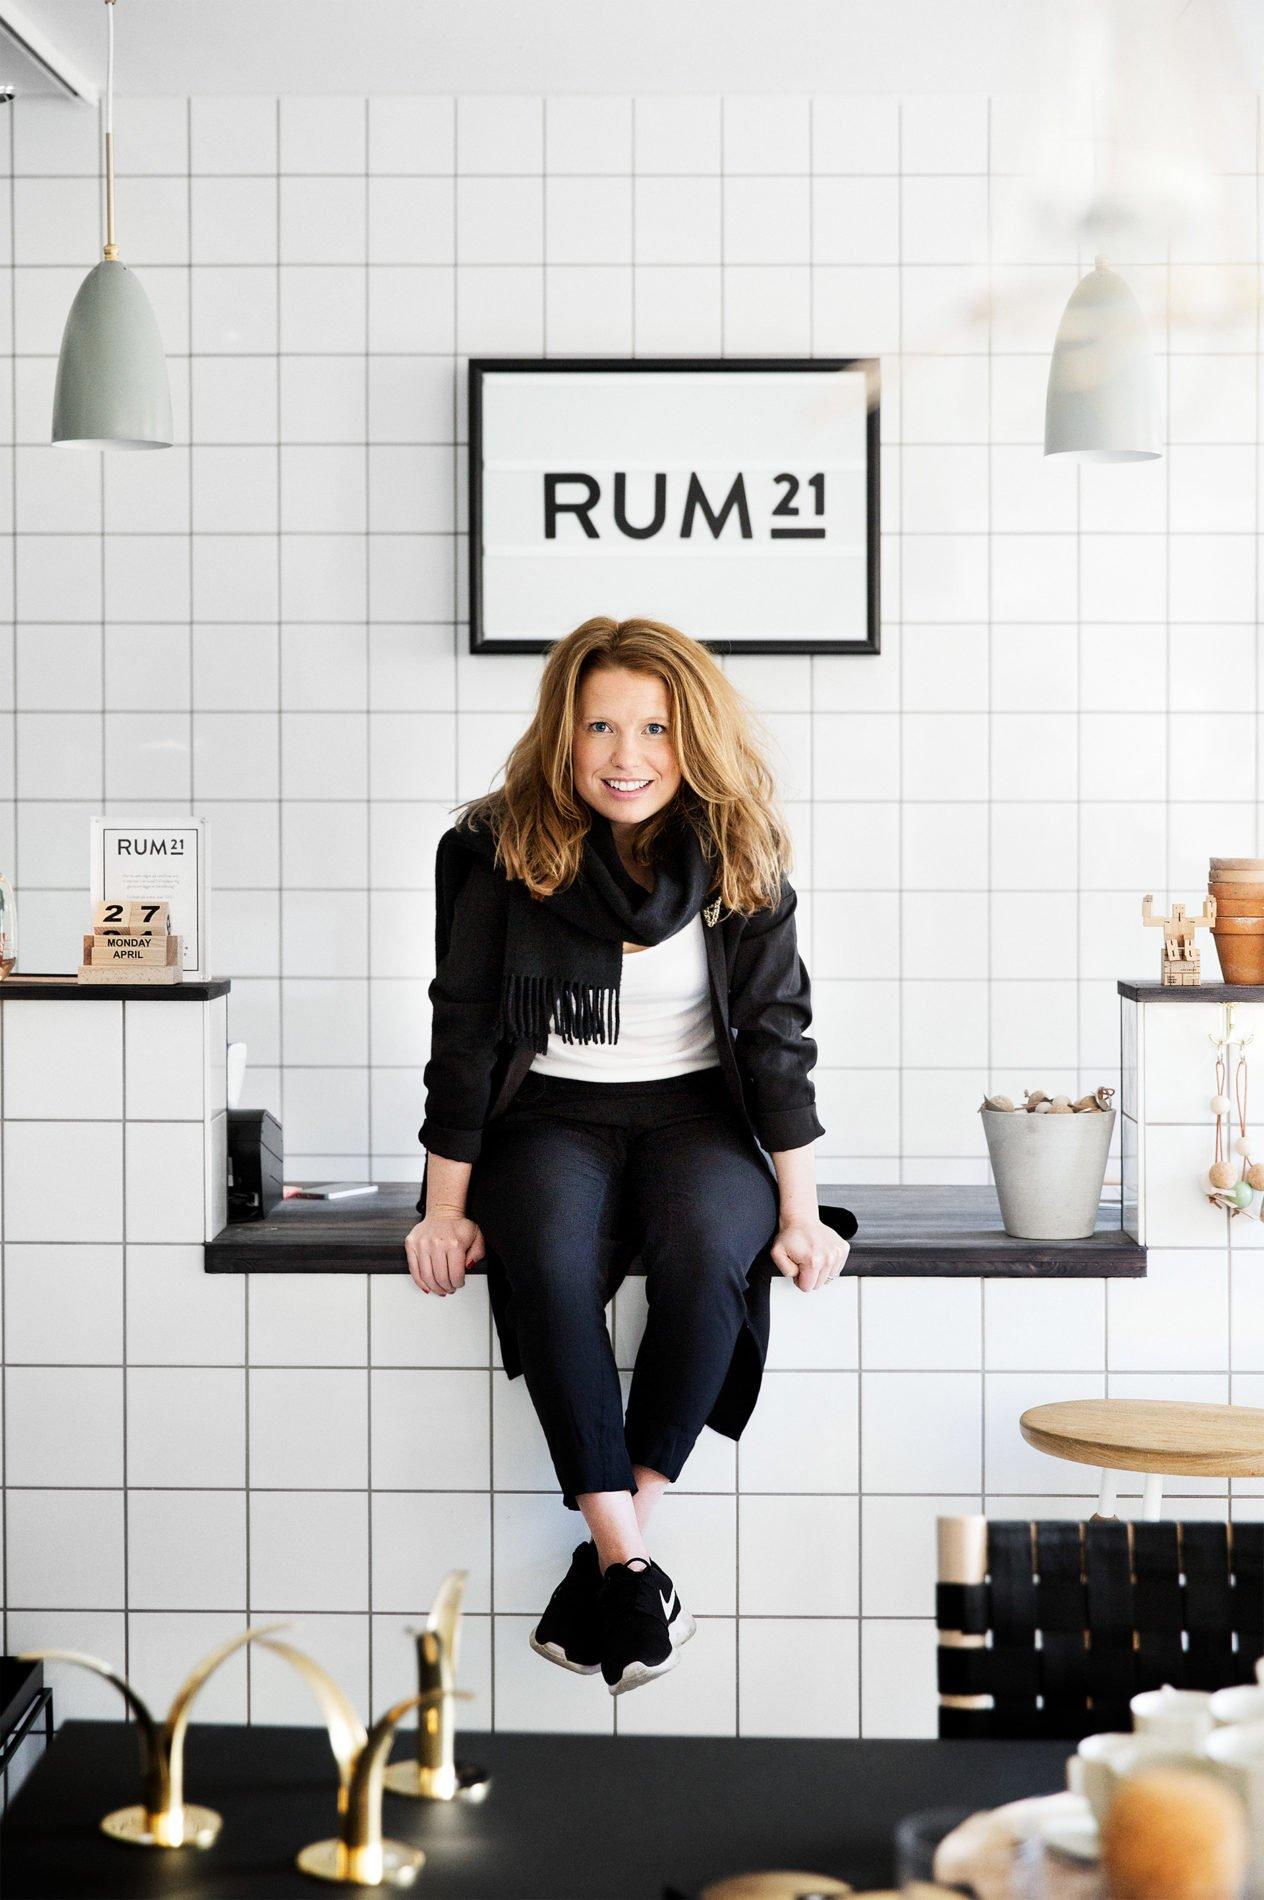 Rum 21, Göteborg